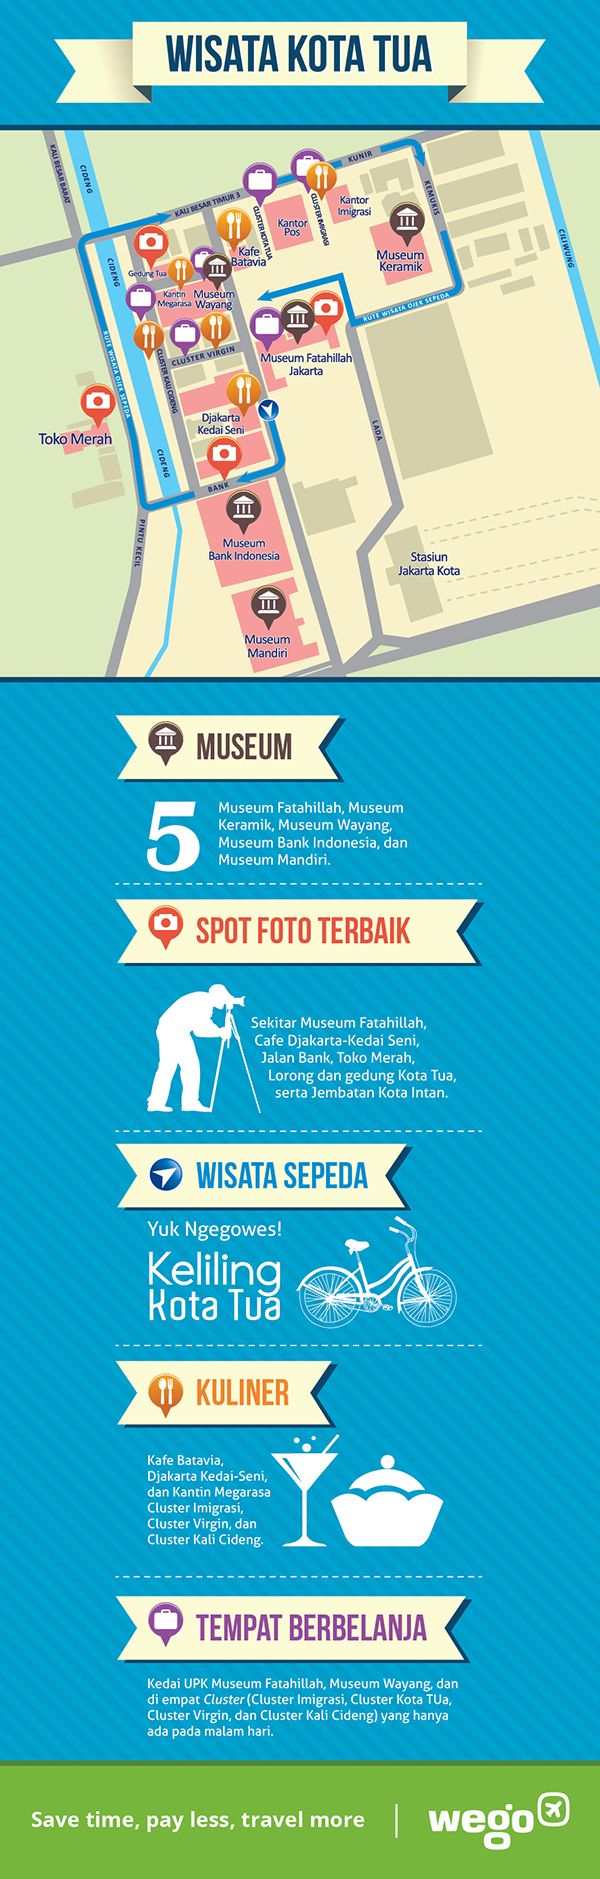 Peta wisata Kota Tua, Jakarta  (infographis by Choirul Anwar)